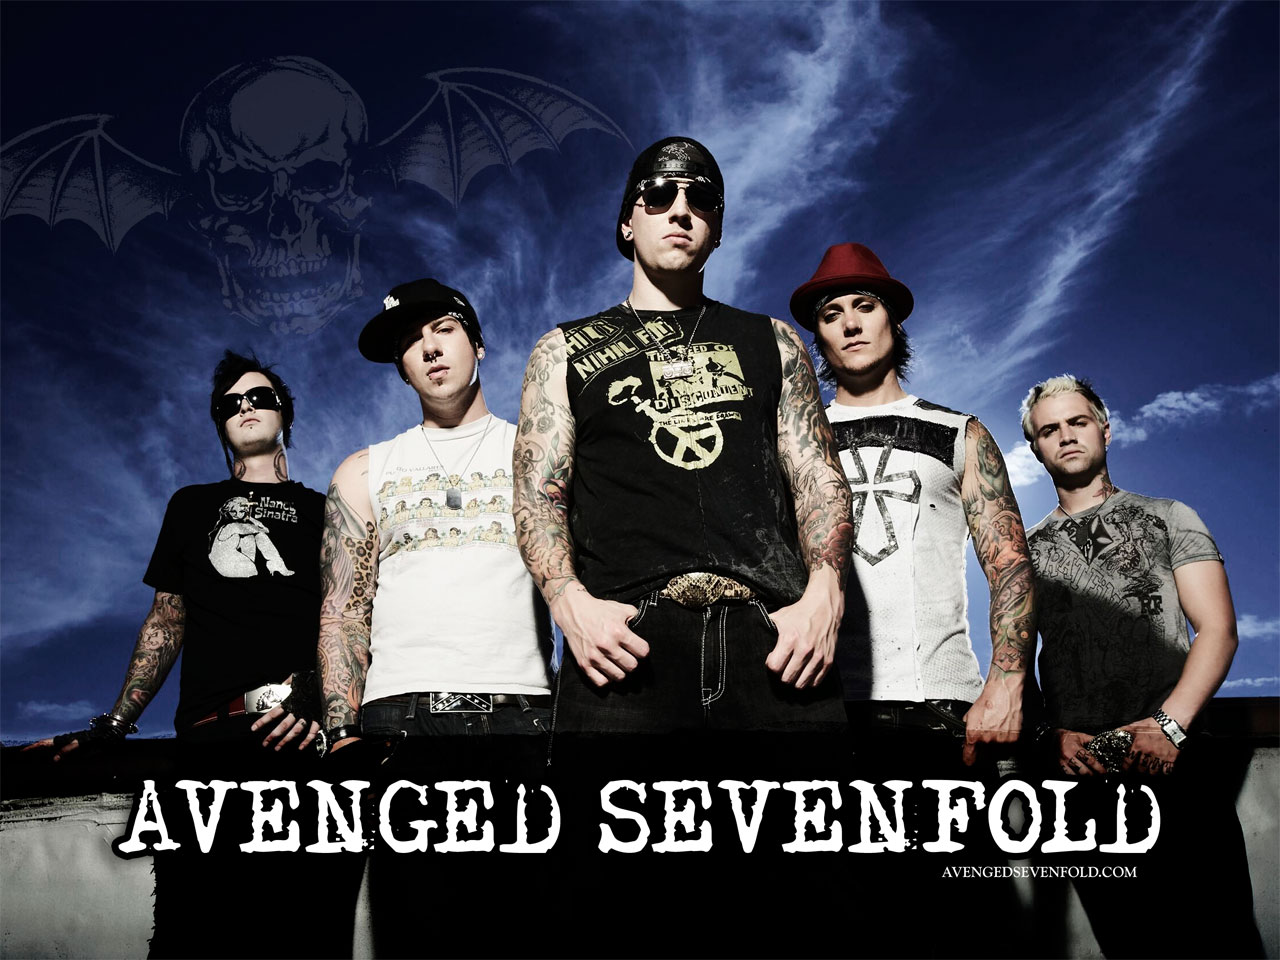 http://2.bp.blogspot.com/-P6_hjQRXWv8/Tey6pqOd-cI/AAAAAAAAAFc/2IQ735IZqOw/s1600/Avenged-Sevenfold-2-Wallpaper.jpg